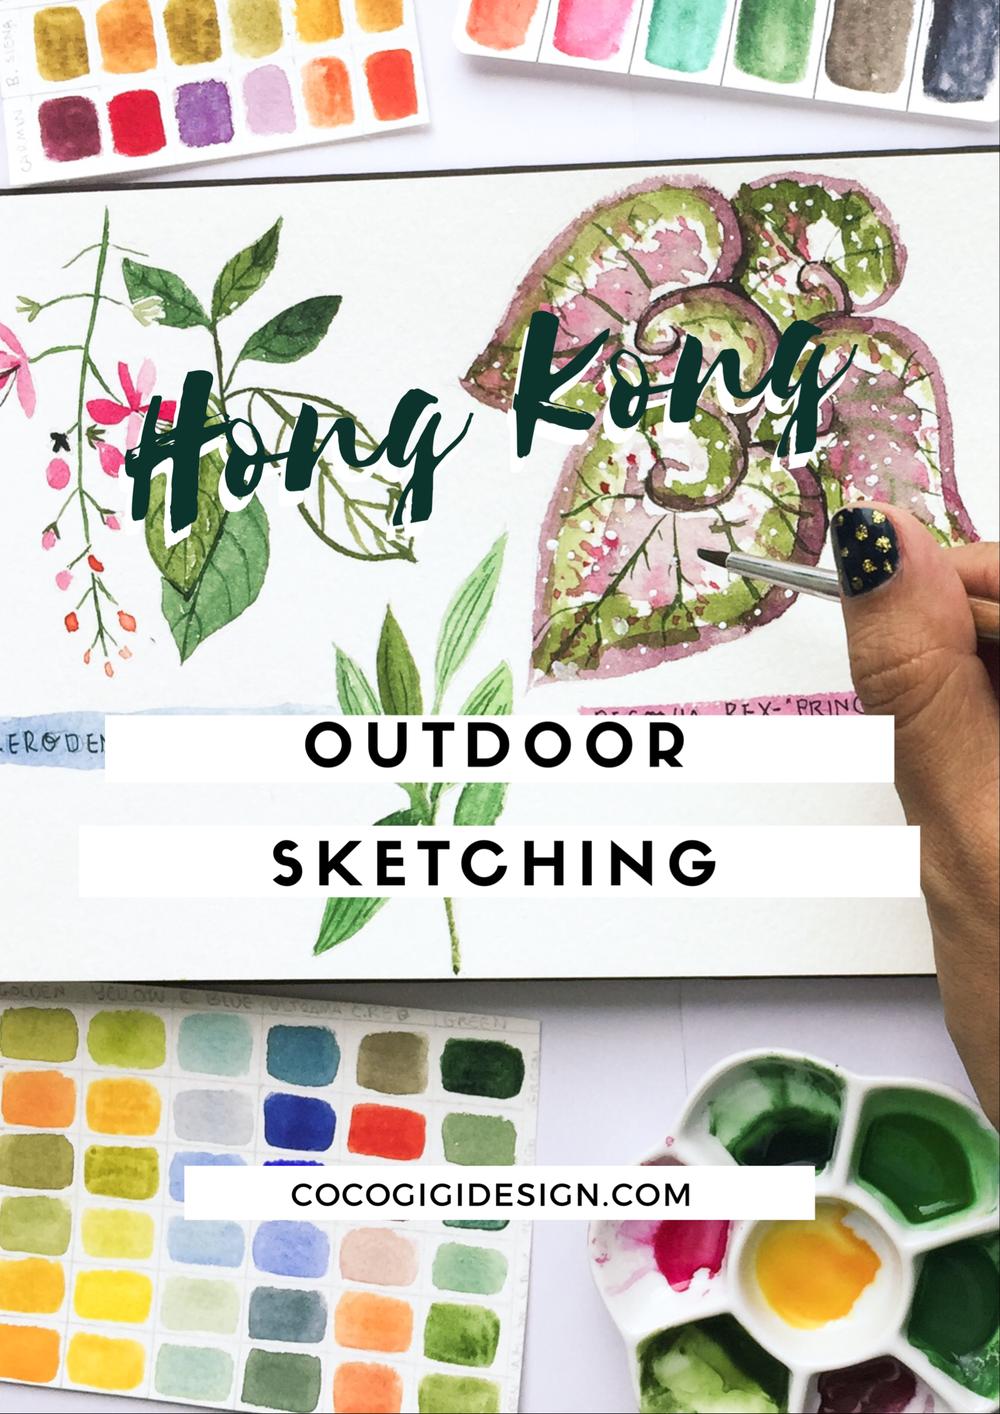 Gina Maldonado - Outdoor Sketching__6050.PNG